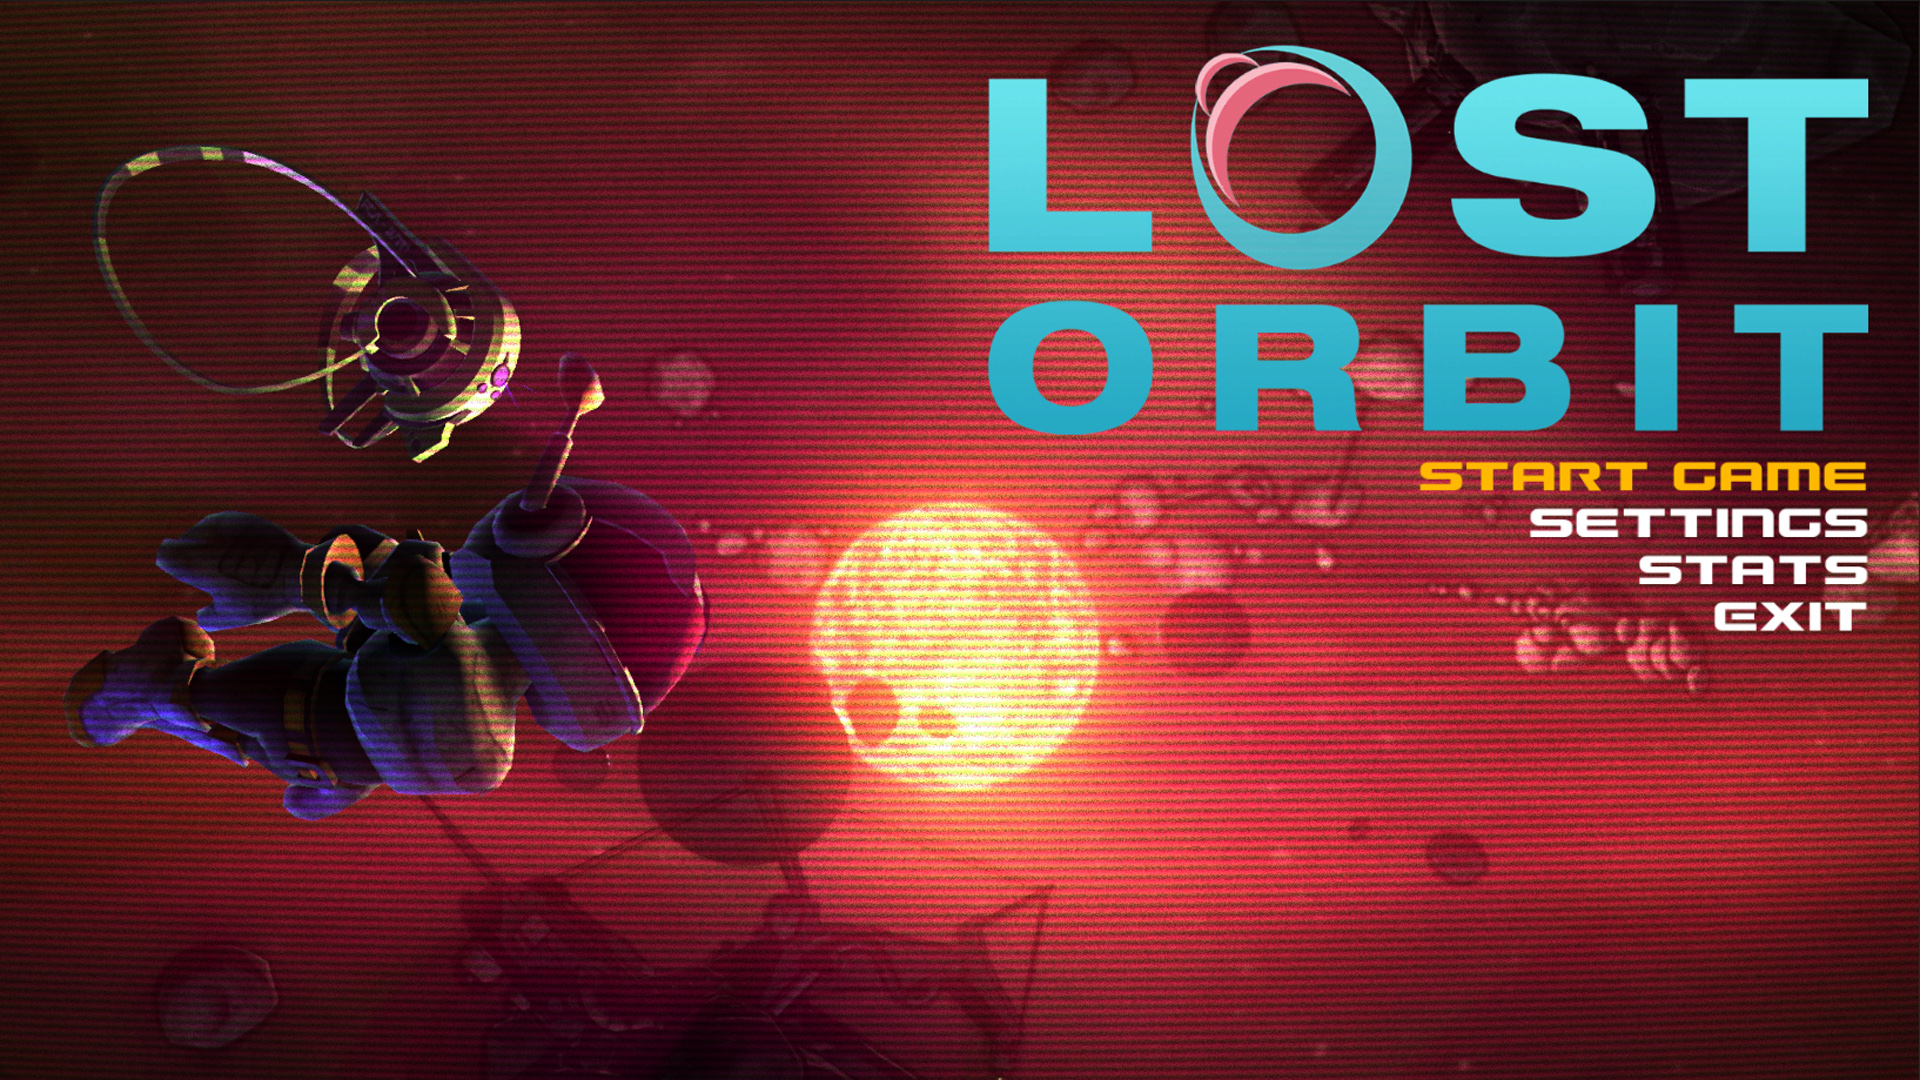 The Menus of LOST ORBIT